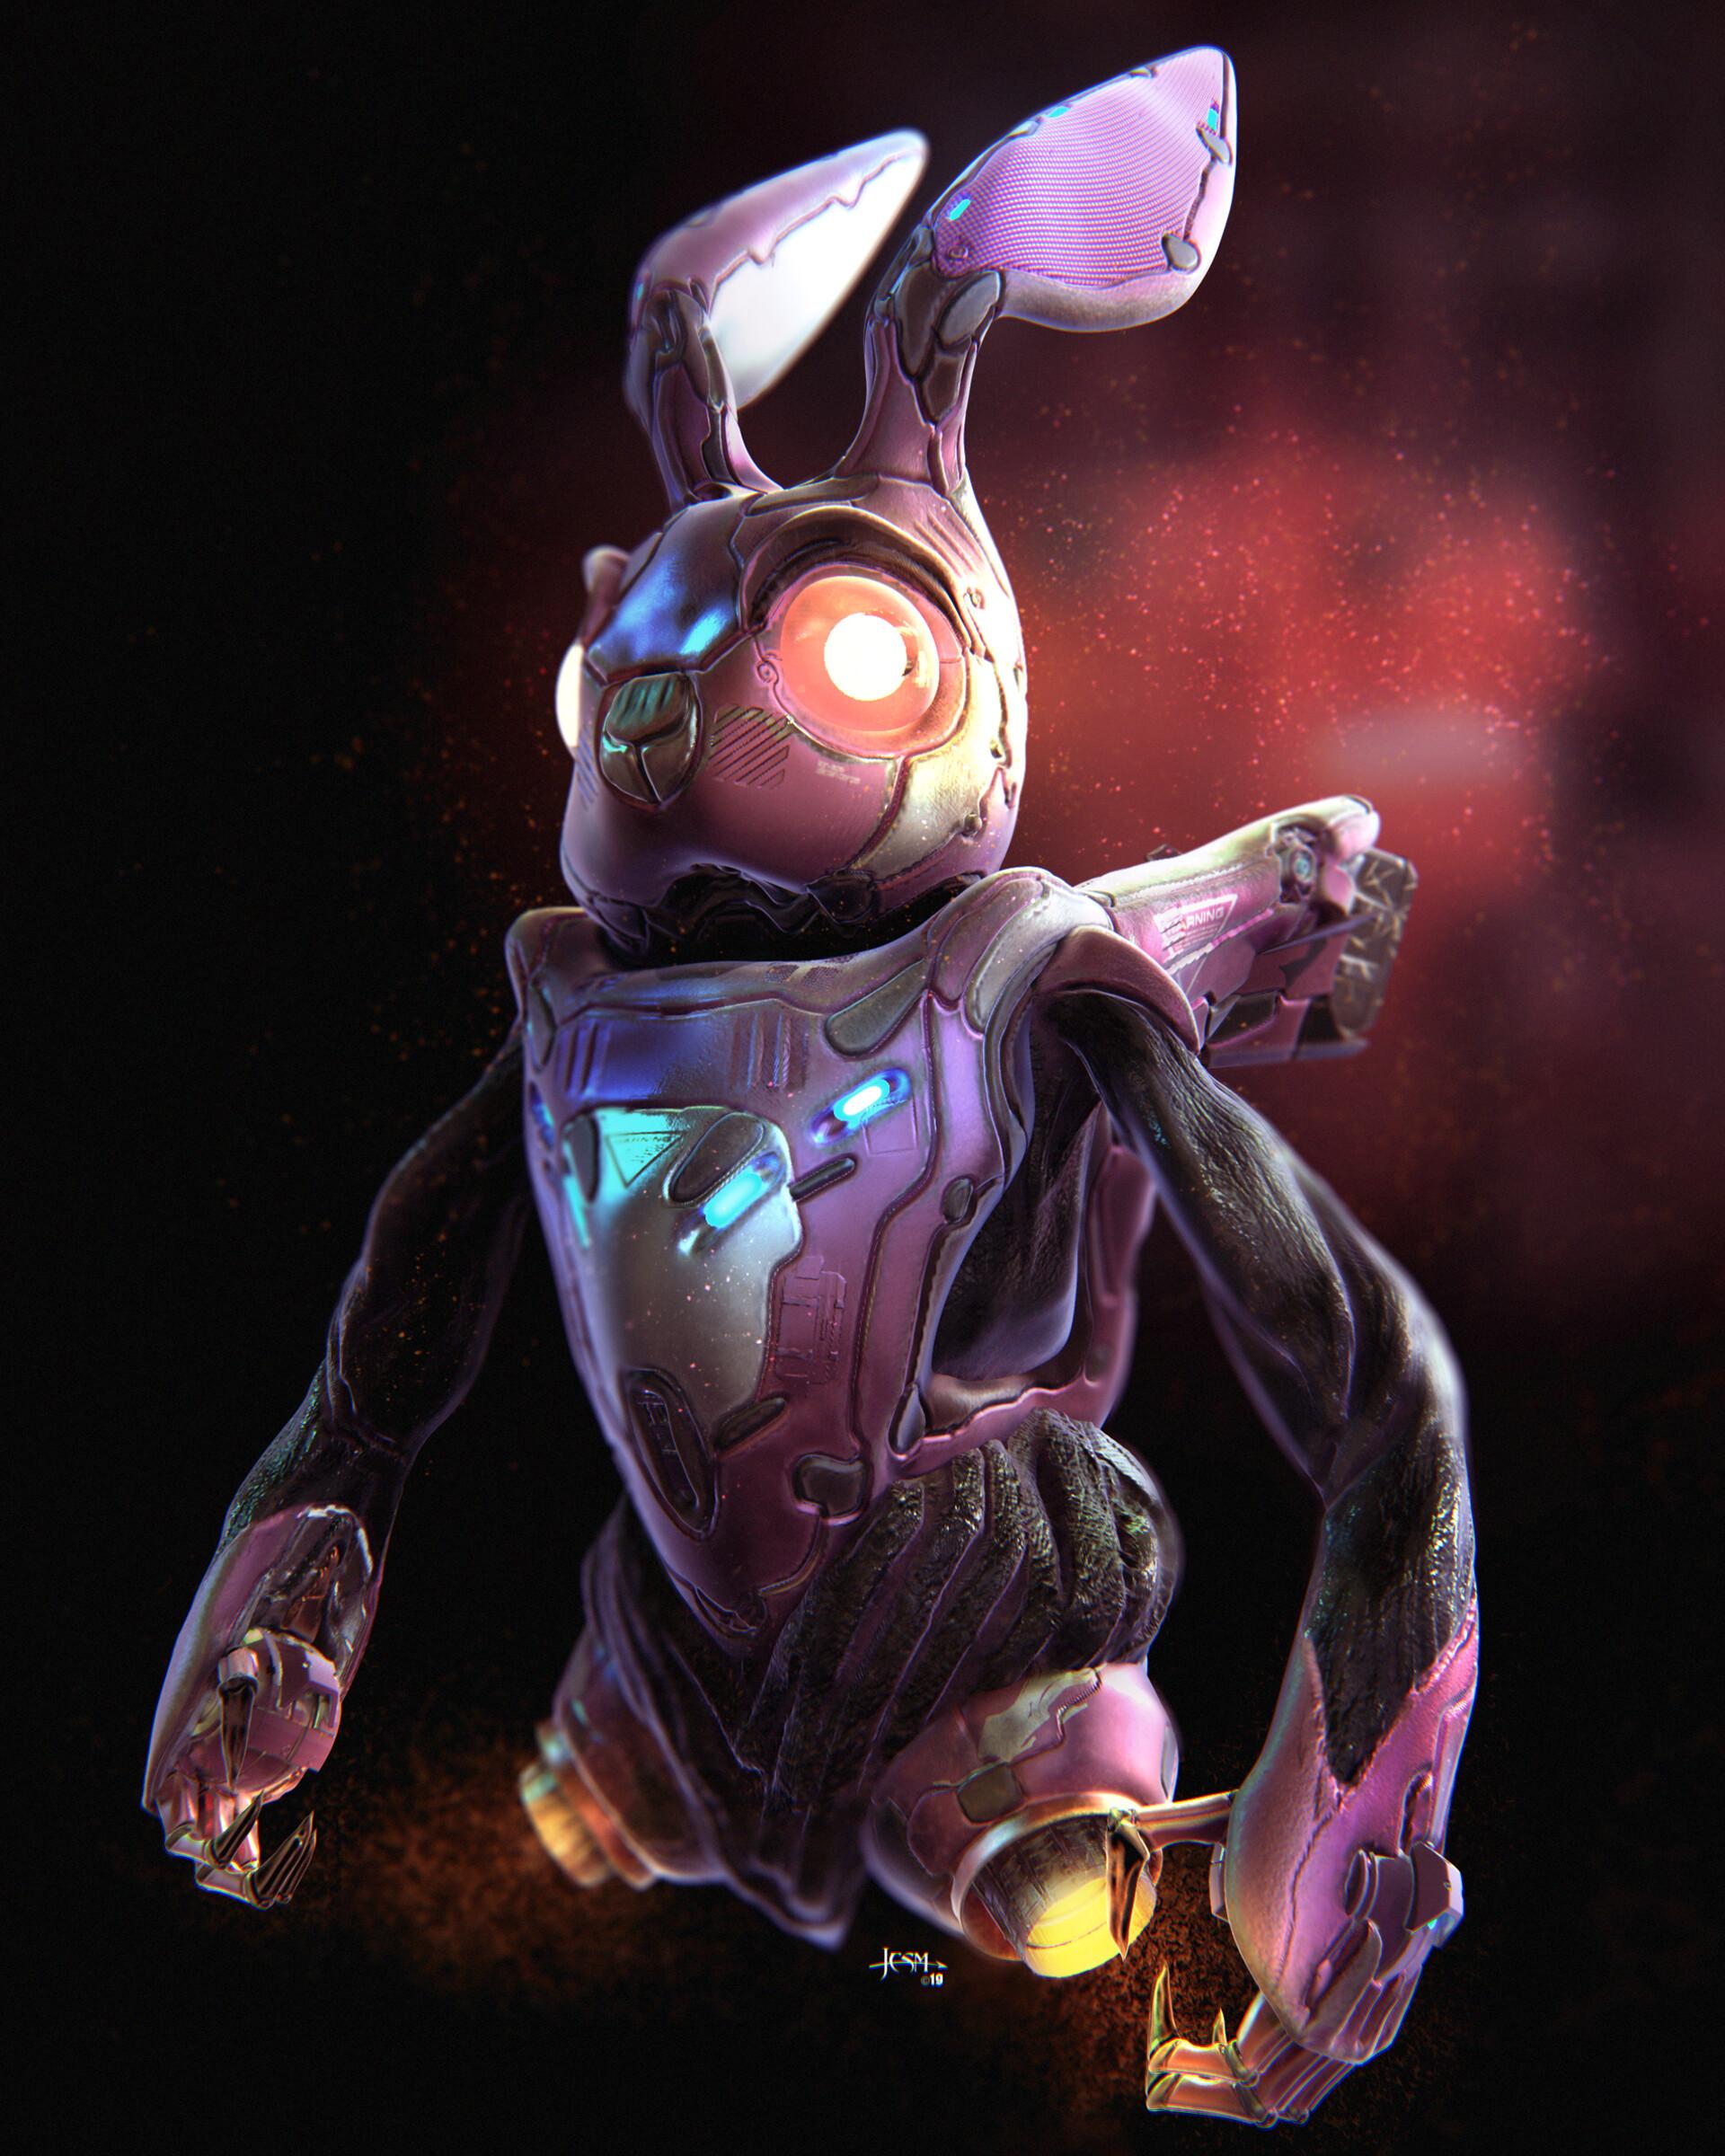 Jean paul ficition bunny